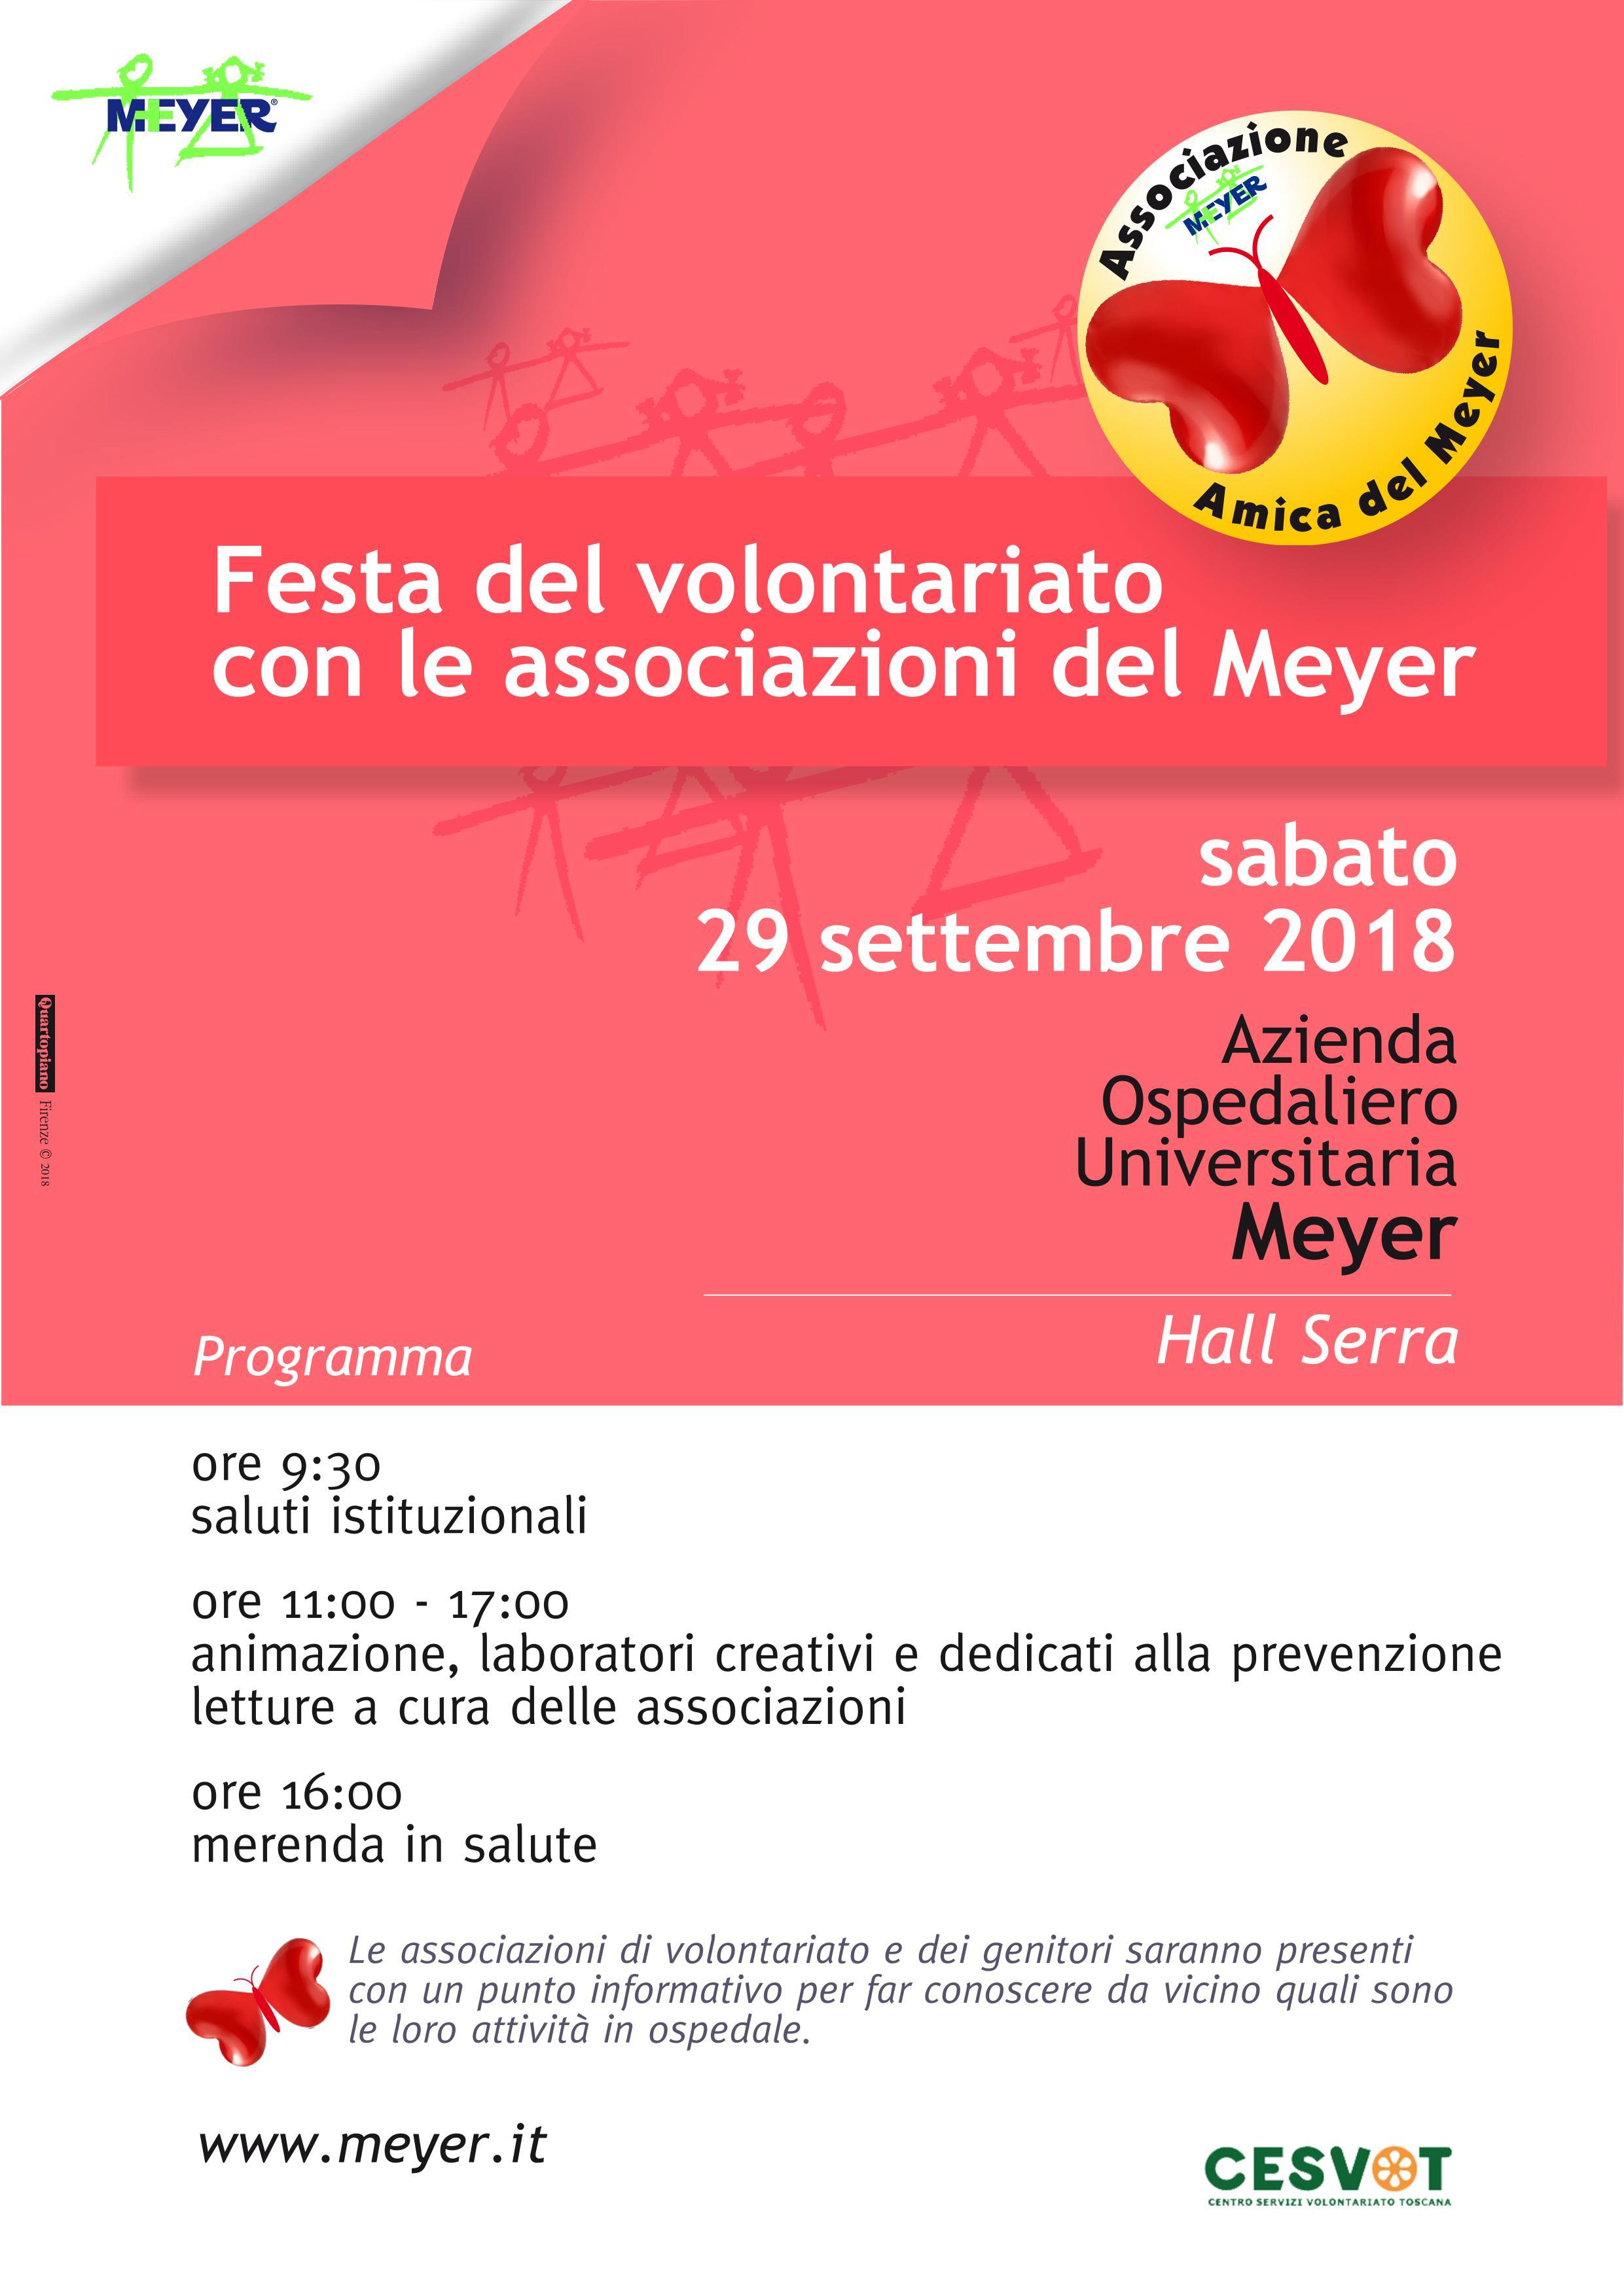 Festa Volontariato al Meyer